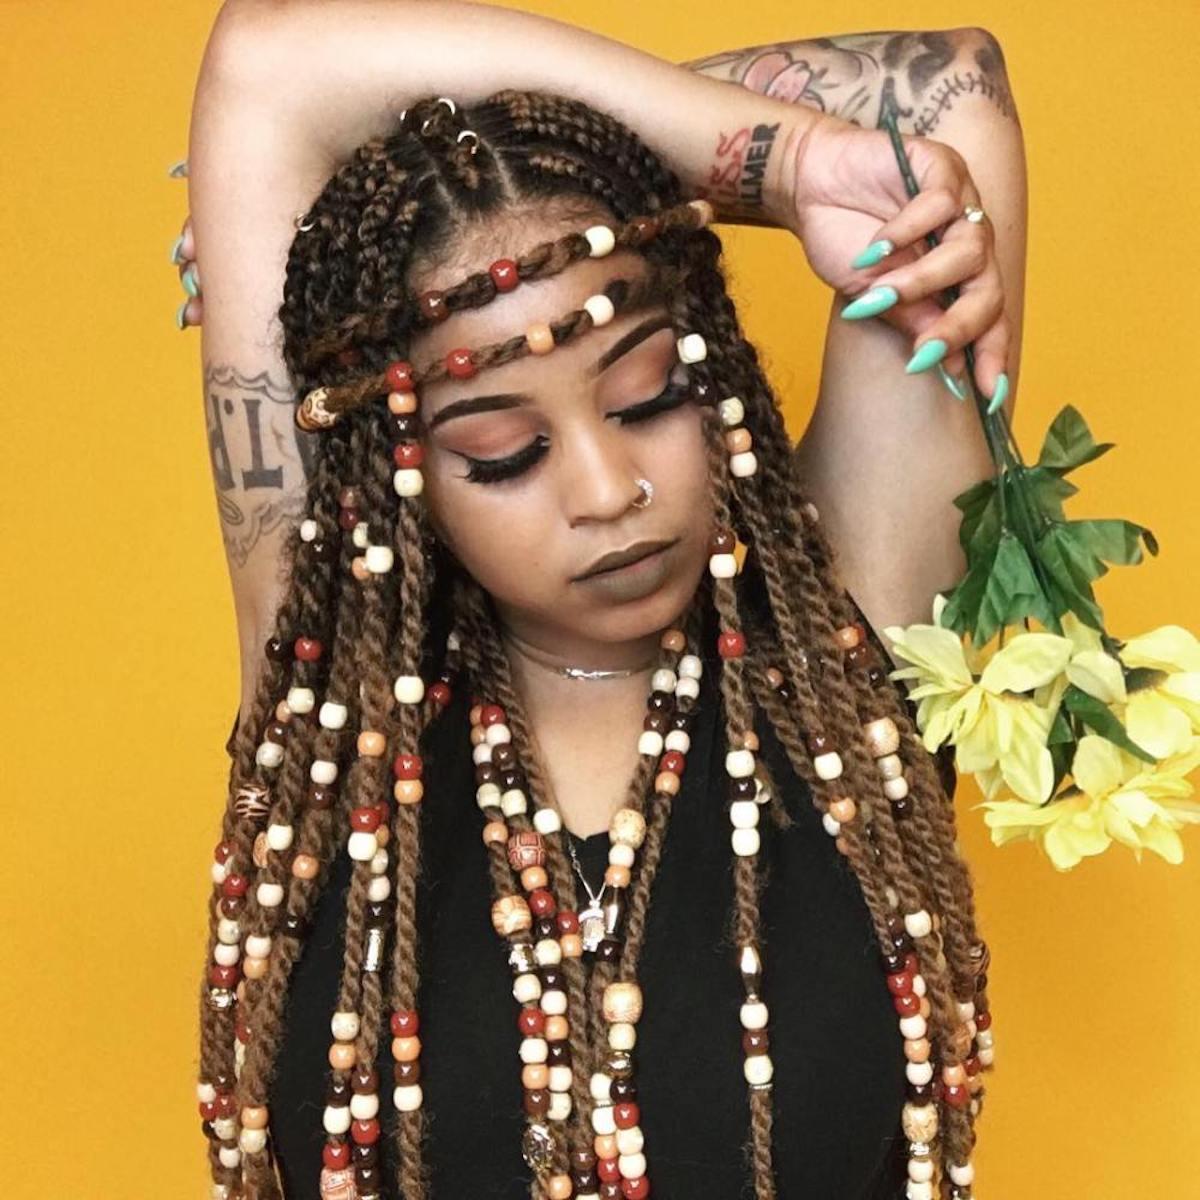 African Hair Styles, African Culture, African Beauty, African History, History of Beads, Black Beautiful Hair, KOLUMN Magazine, KOLUMN, KINDR'D Magazine, KINDR'D, Willoughby Avenue